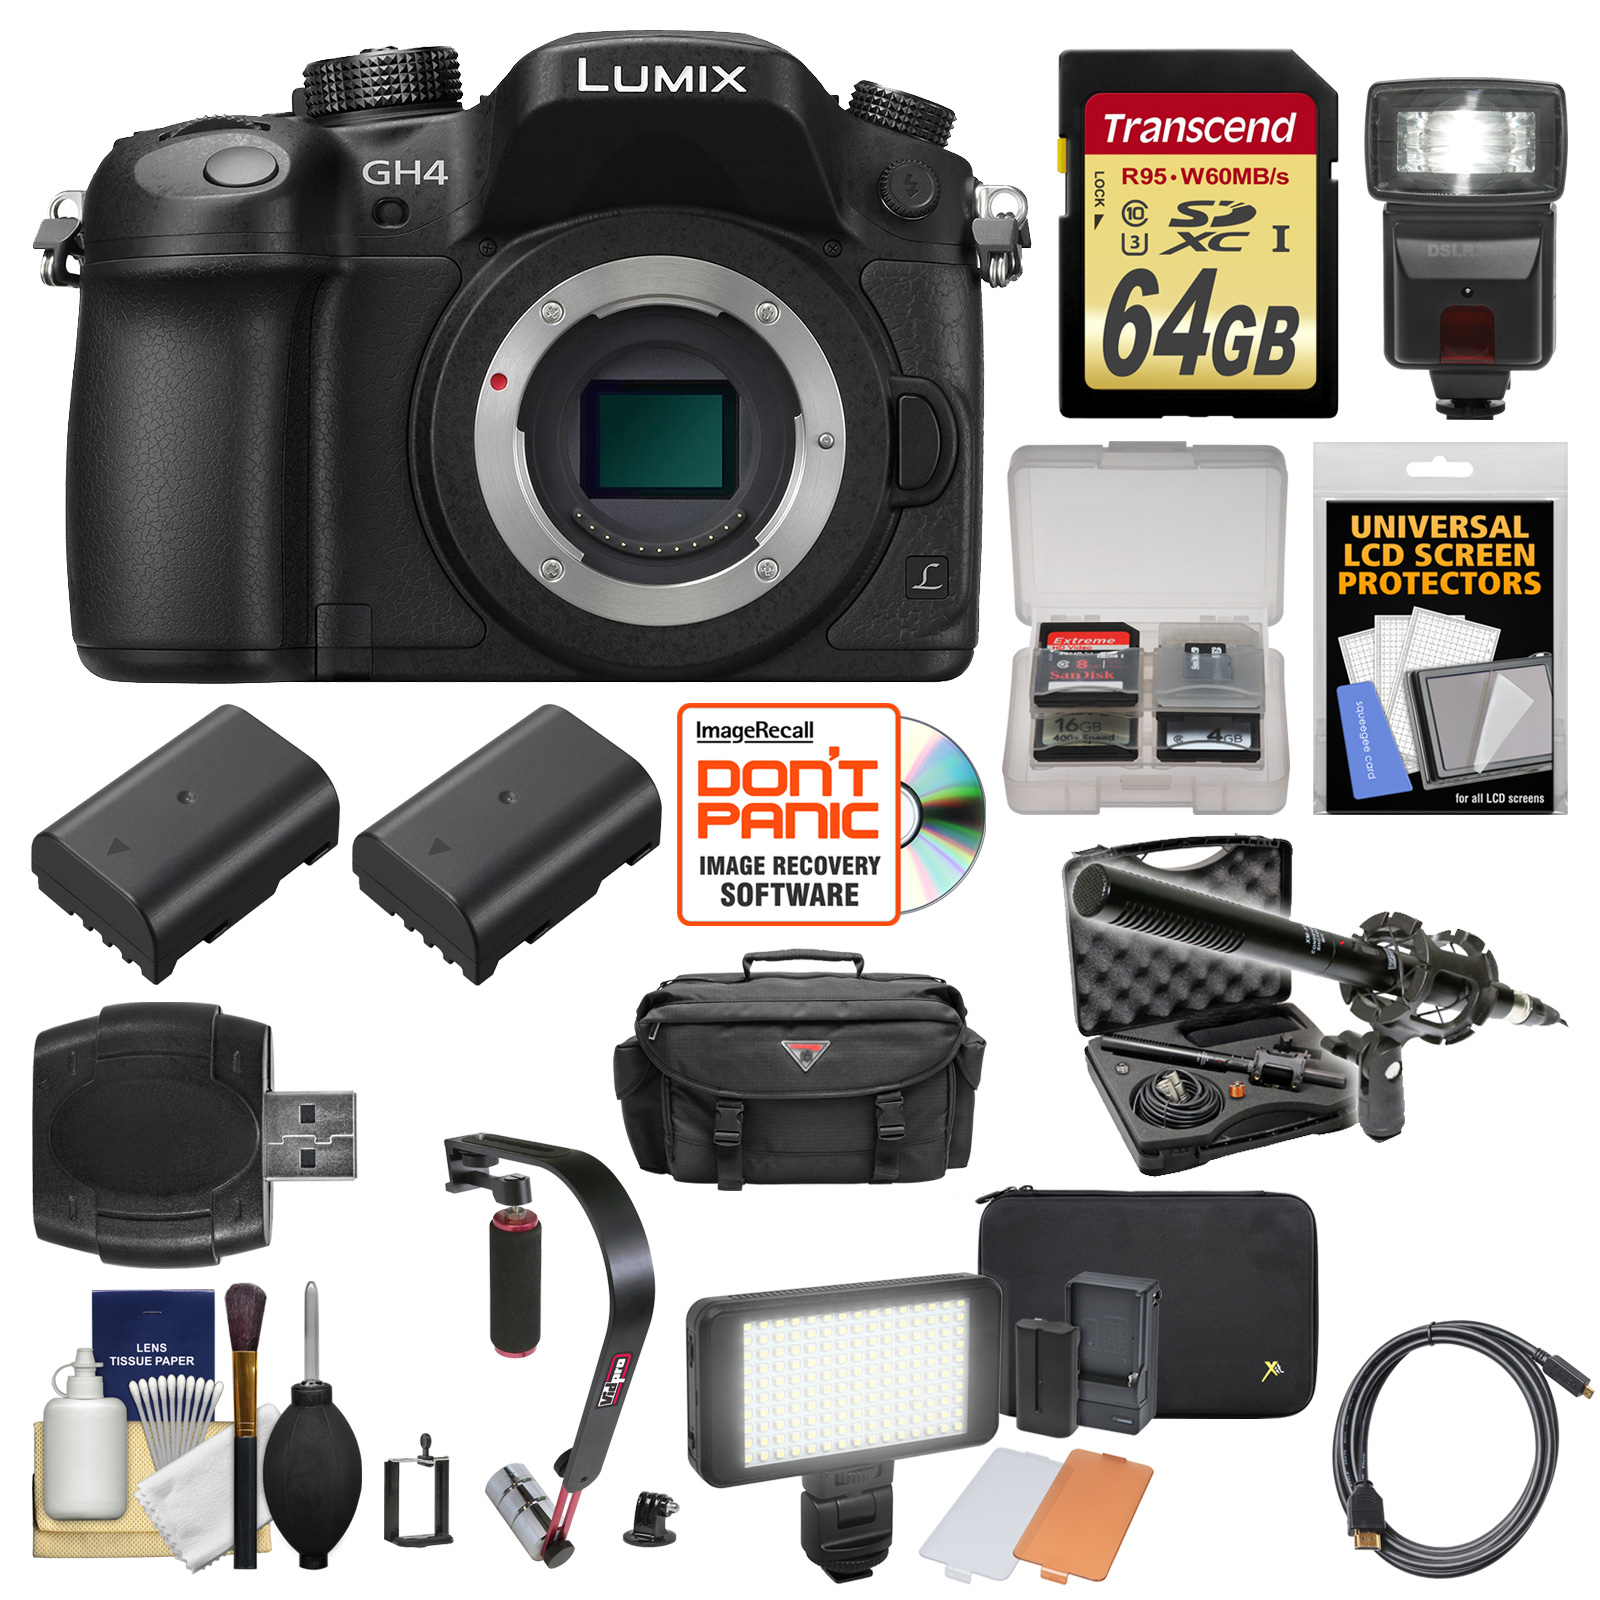 Panasonic Lumix DMC-GH4 4K Micro Four Thirds Digital Camera Body with 64GB Card + Case + Flash + 2 Batteries +... by Panasonic